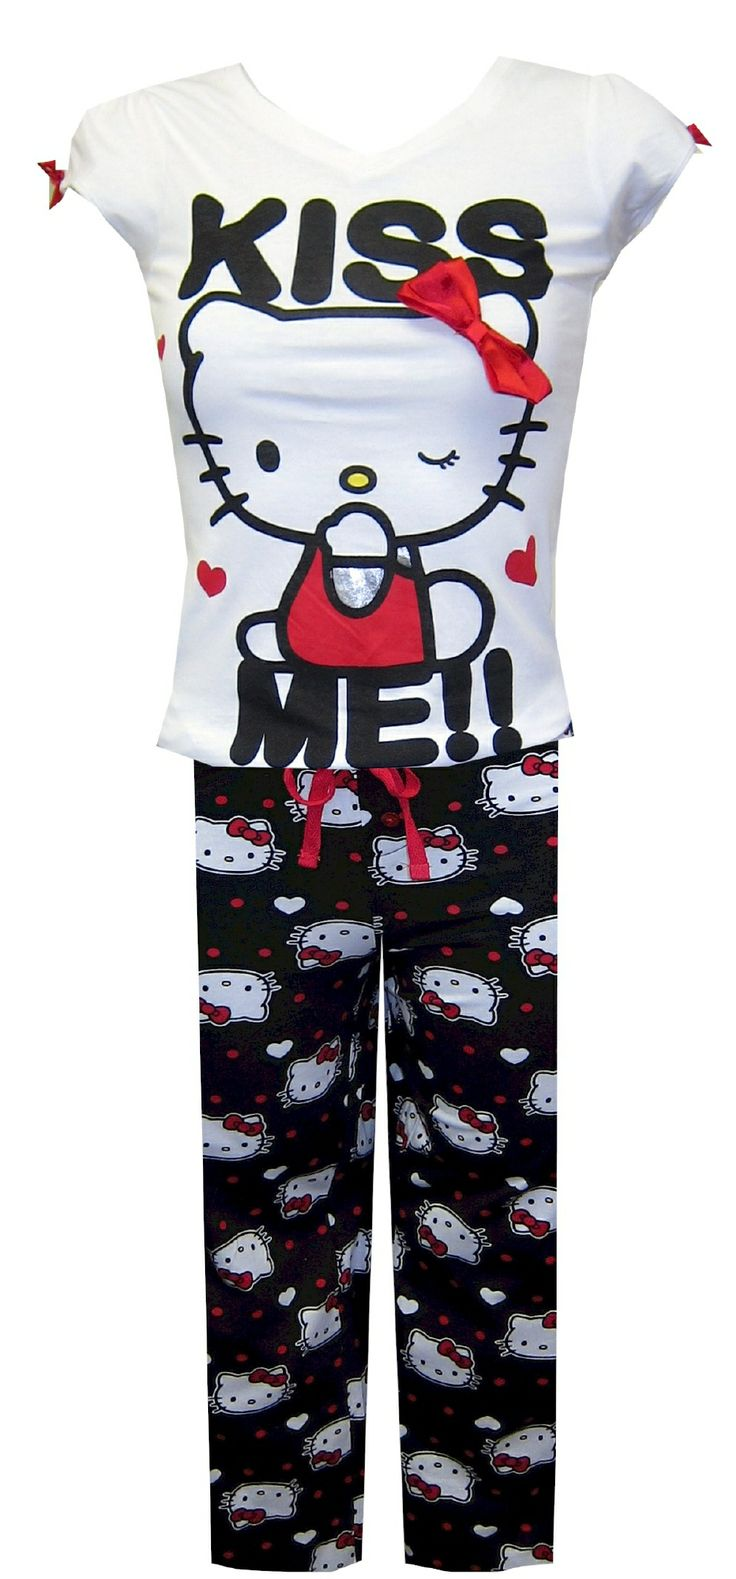 Black and white hello kitty shower curtain - Hello Kitty Kiss Me Sleep Set